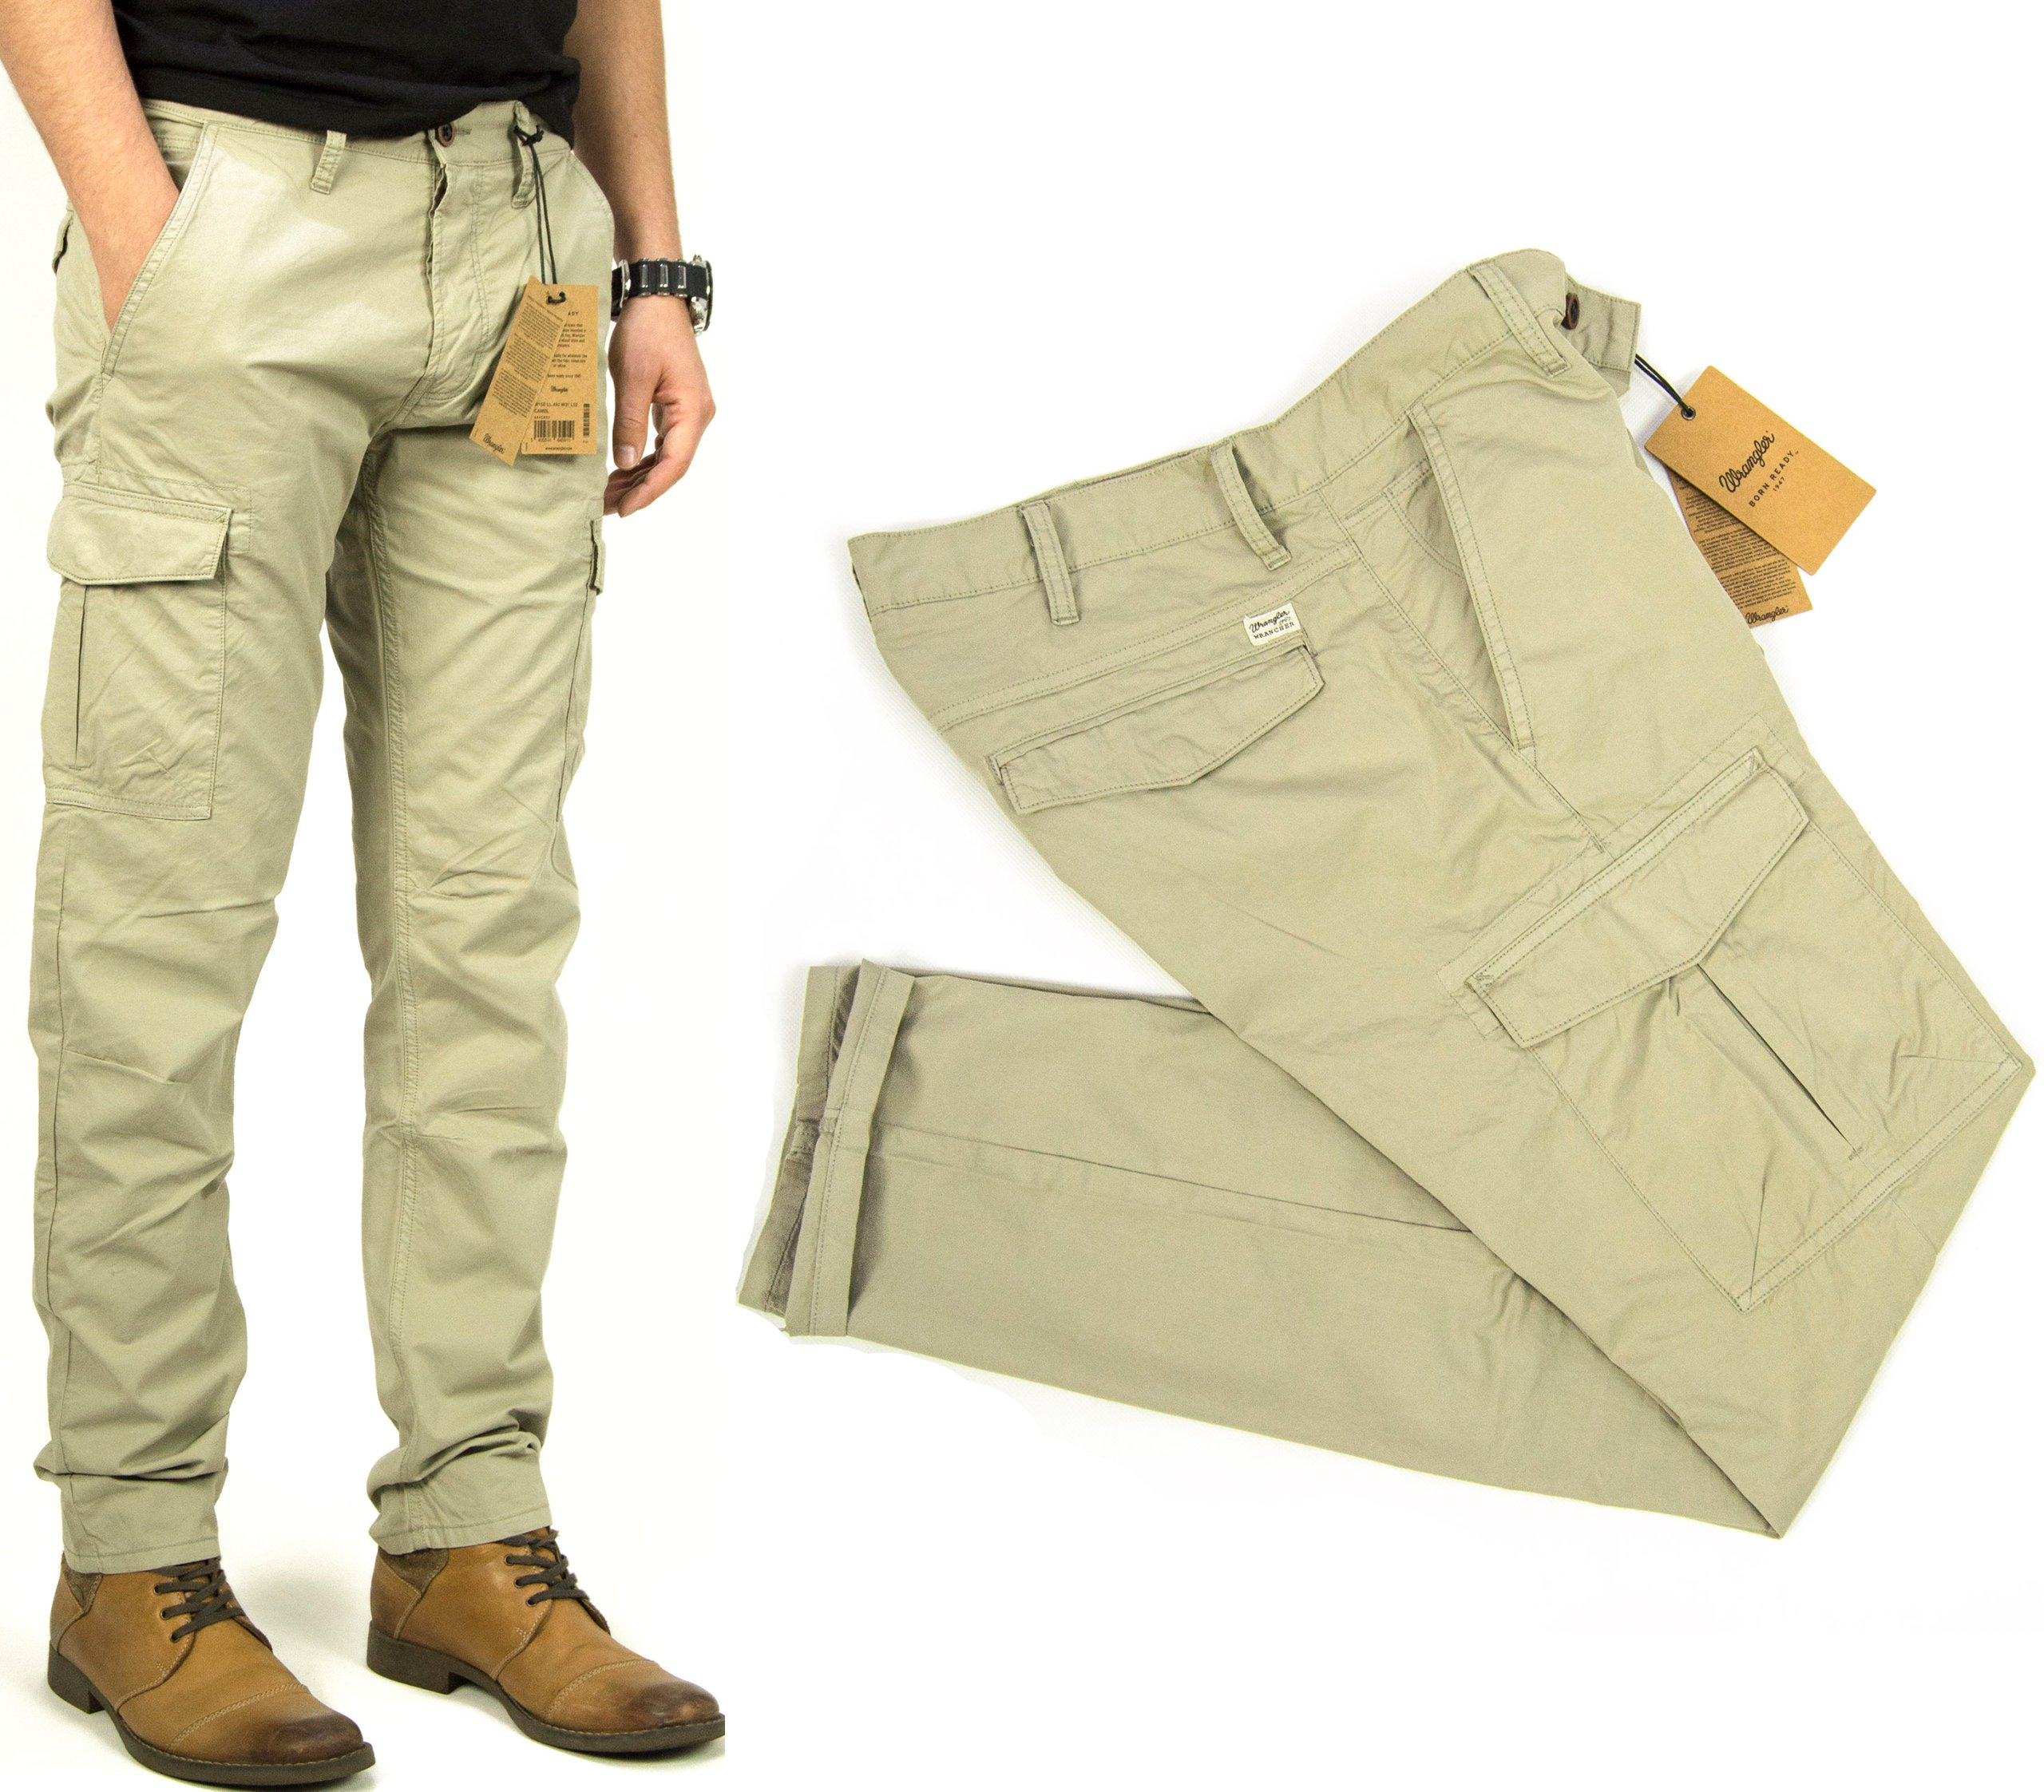 Wrangler Cargo Pants Camel spodnie W28 L32 bojówki